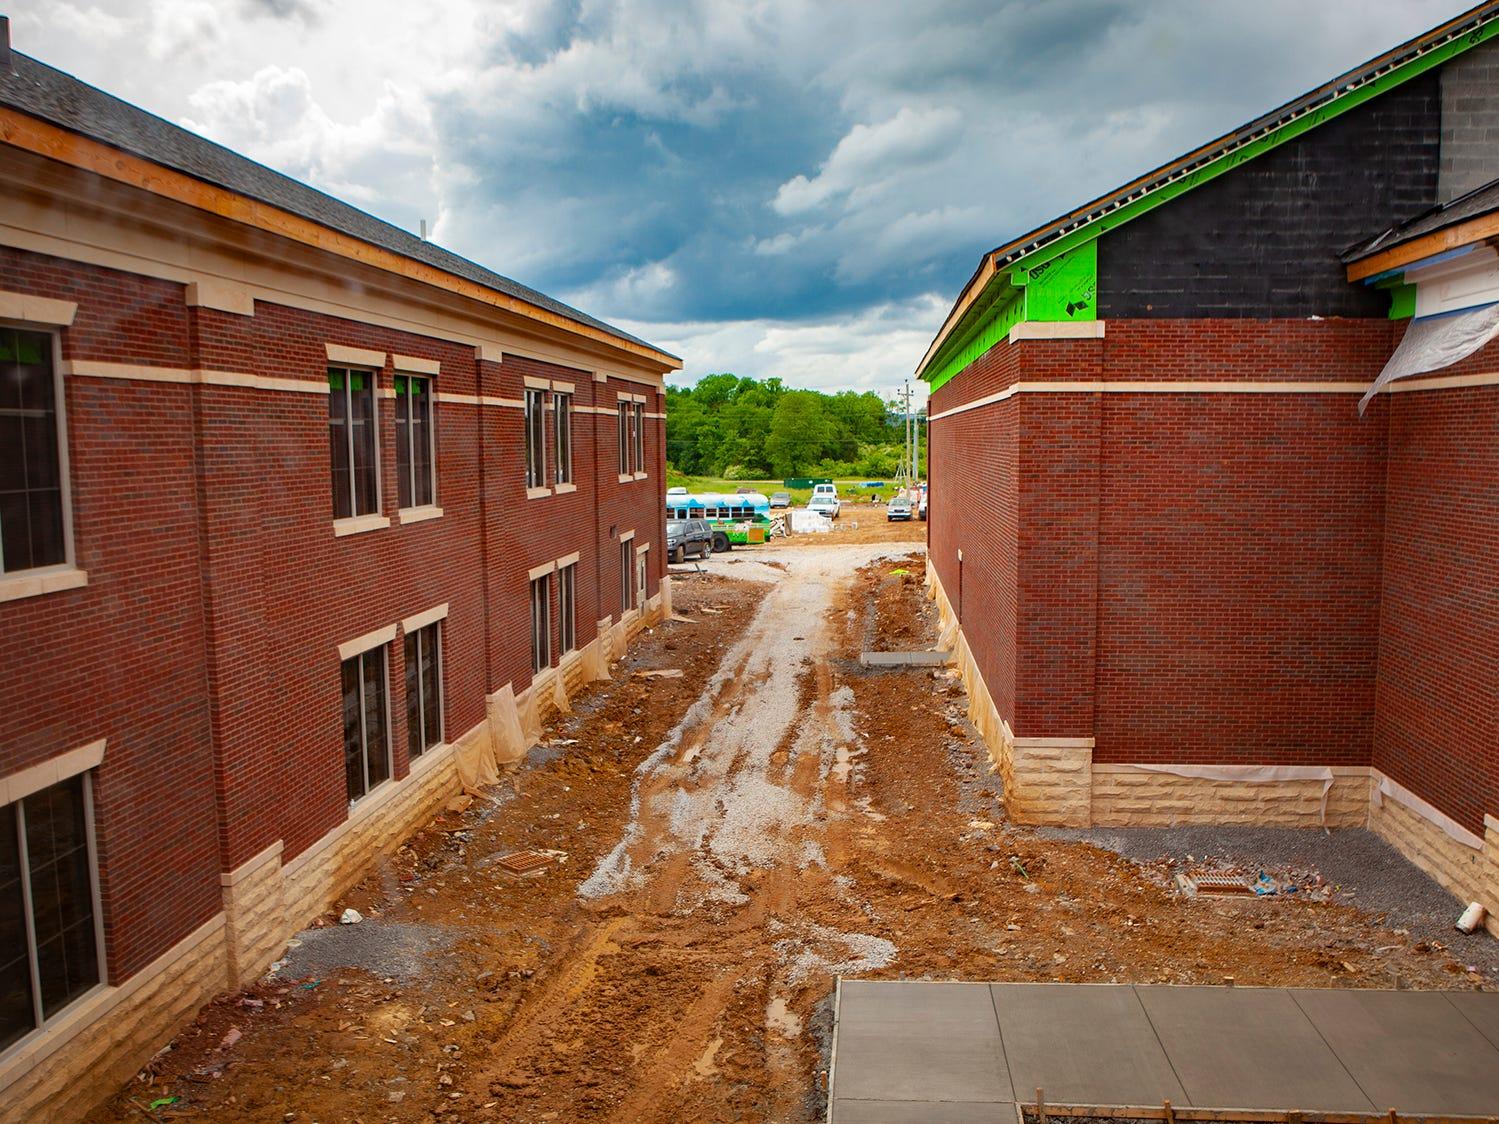 Salem Elementary, Murfreesboro City Schools' 13th campus, will open in July 2019.